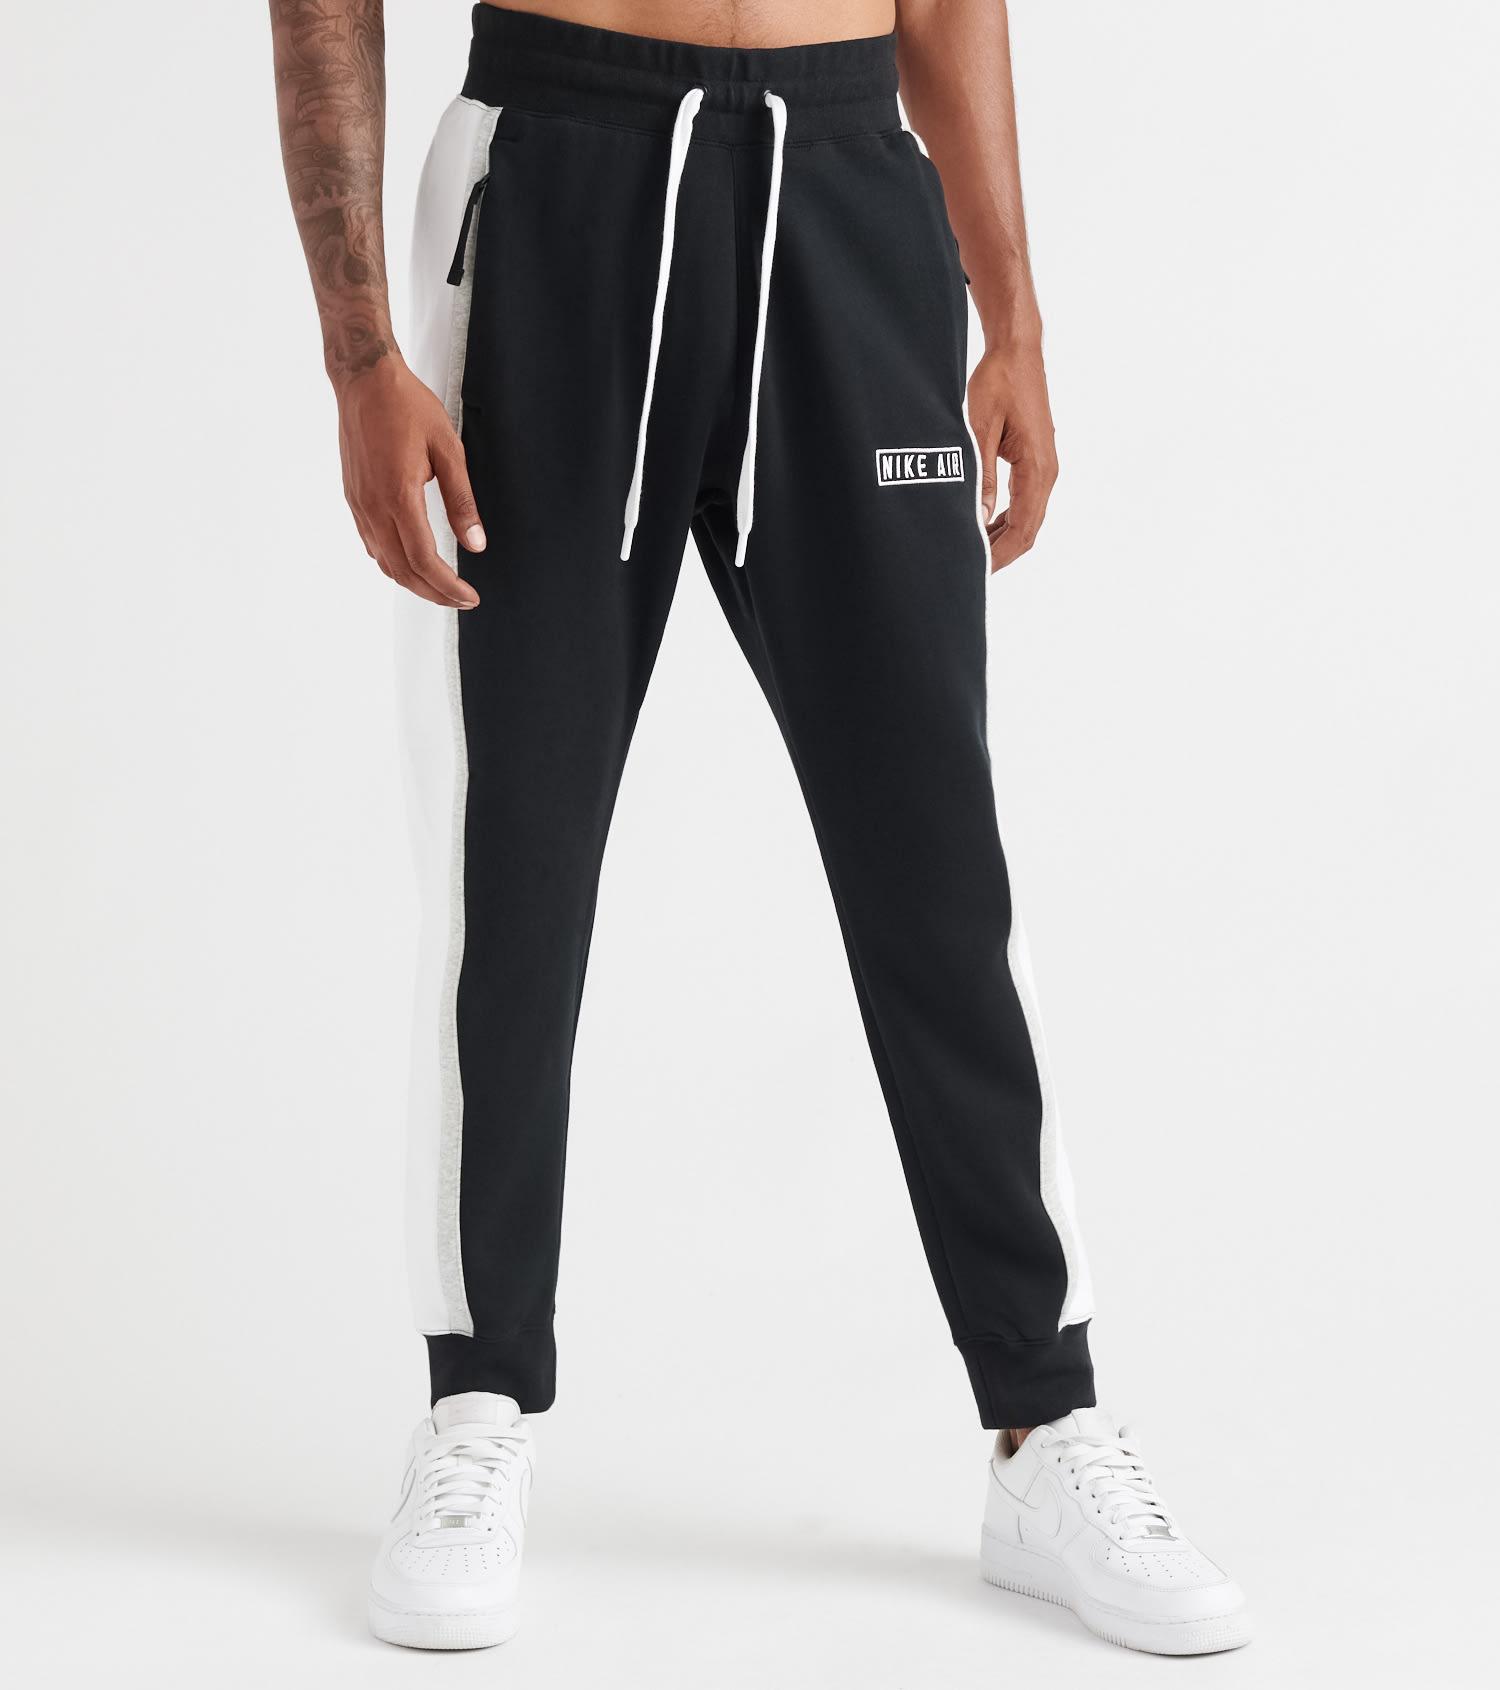 NSW Nike Air Fleece Pants